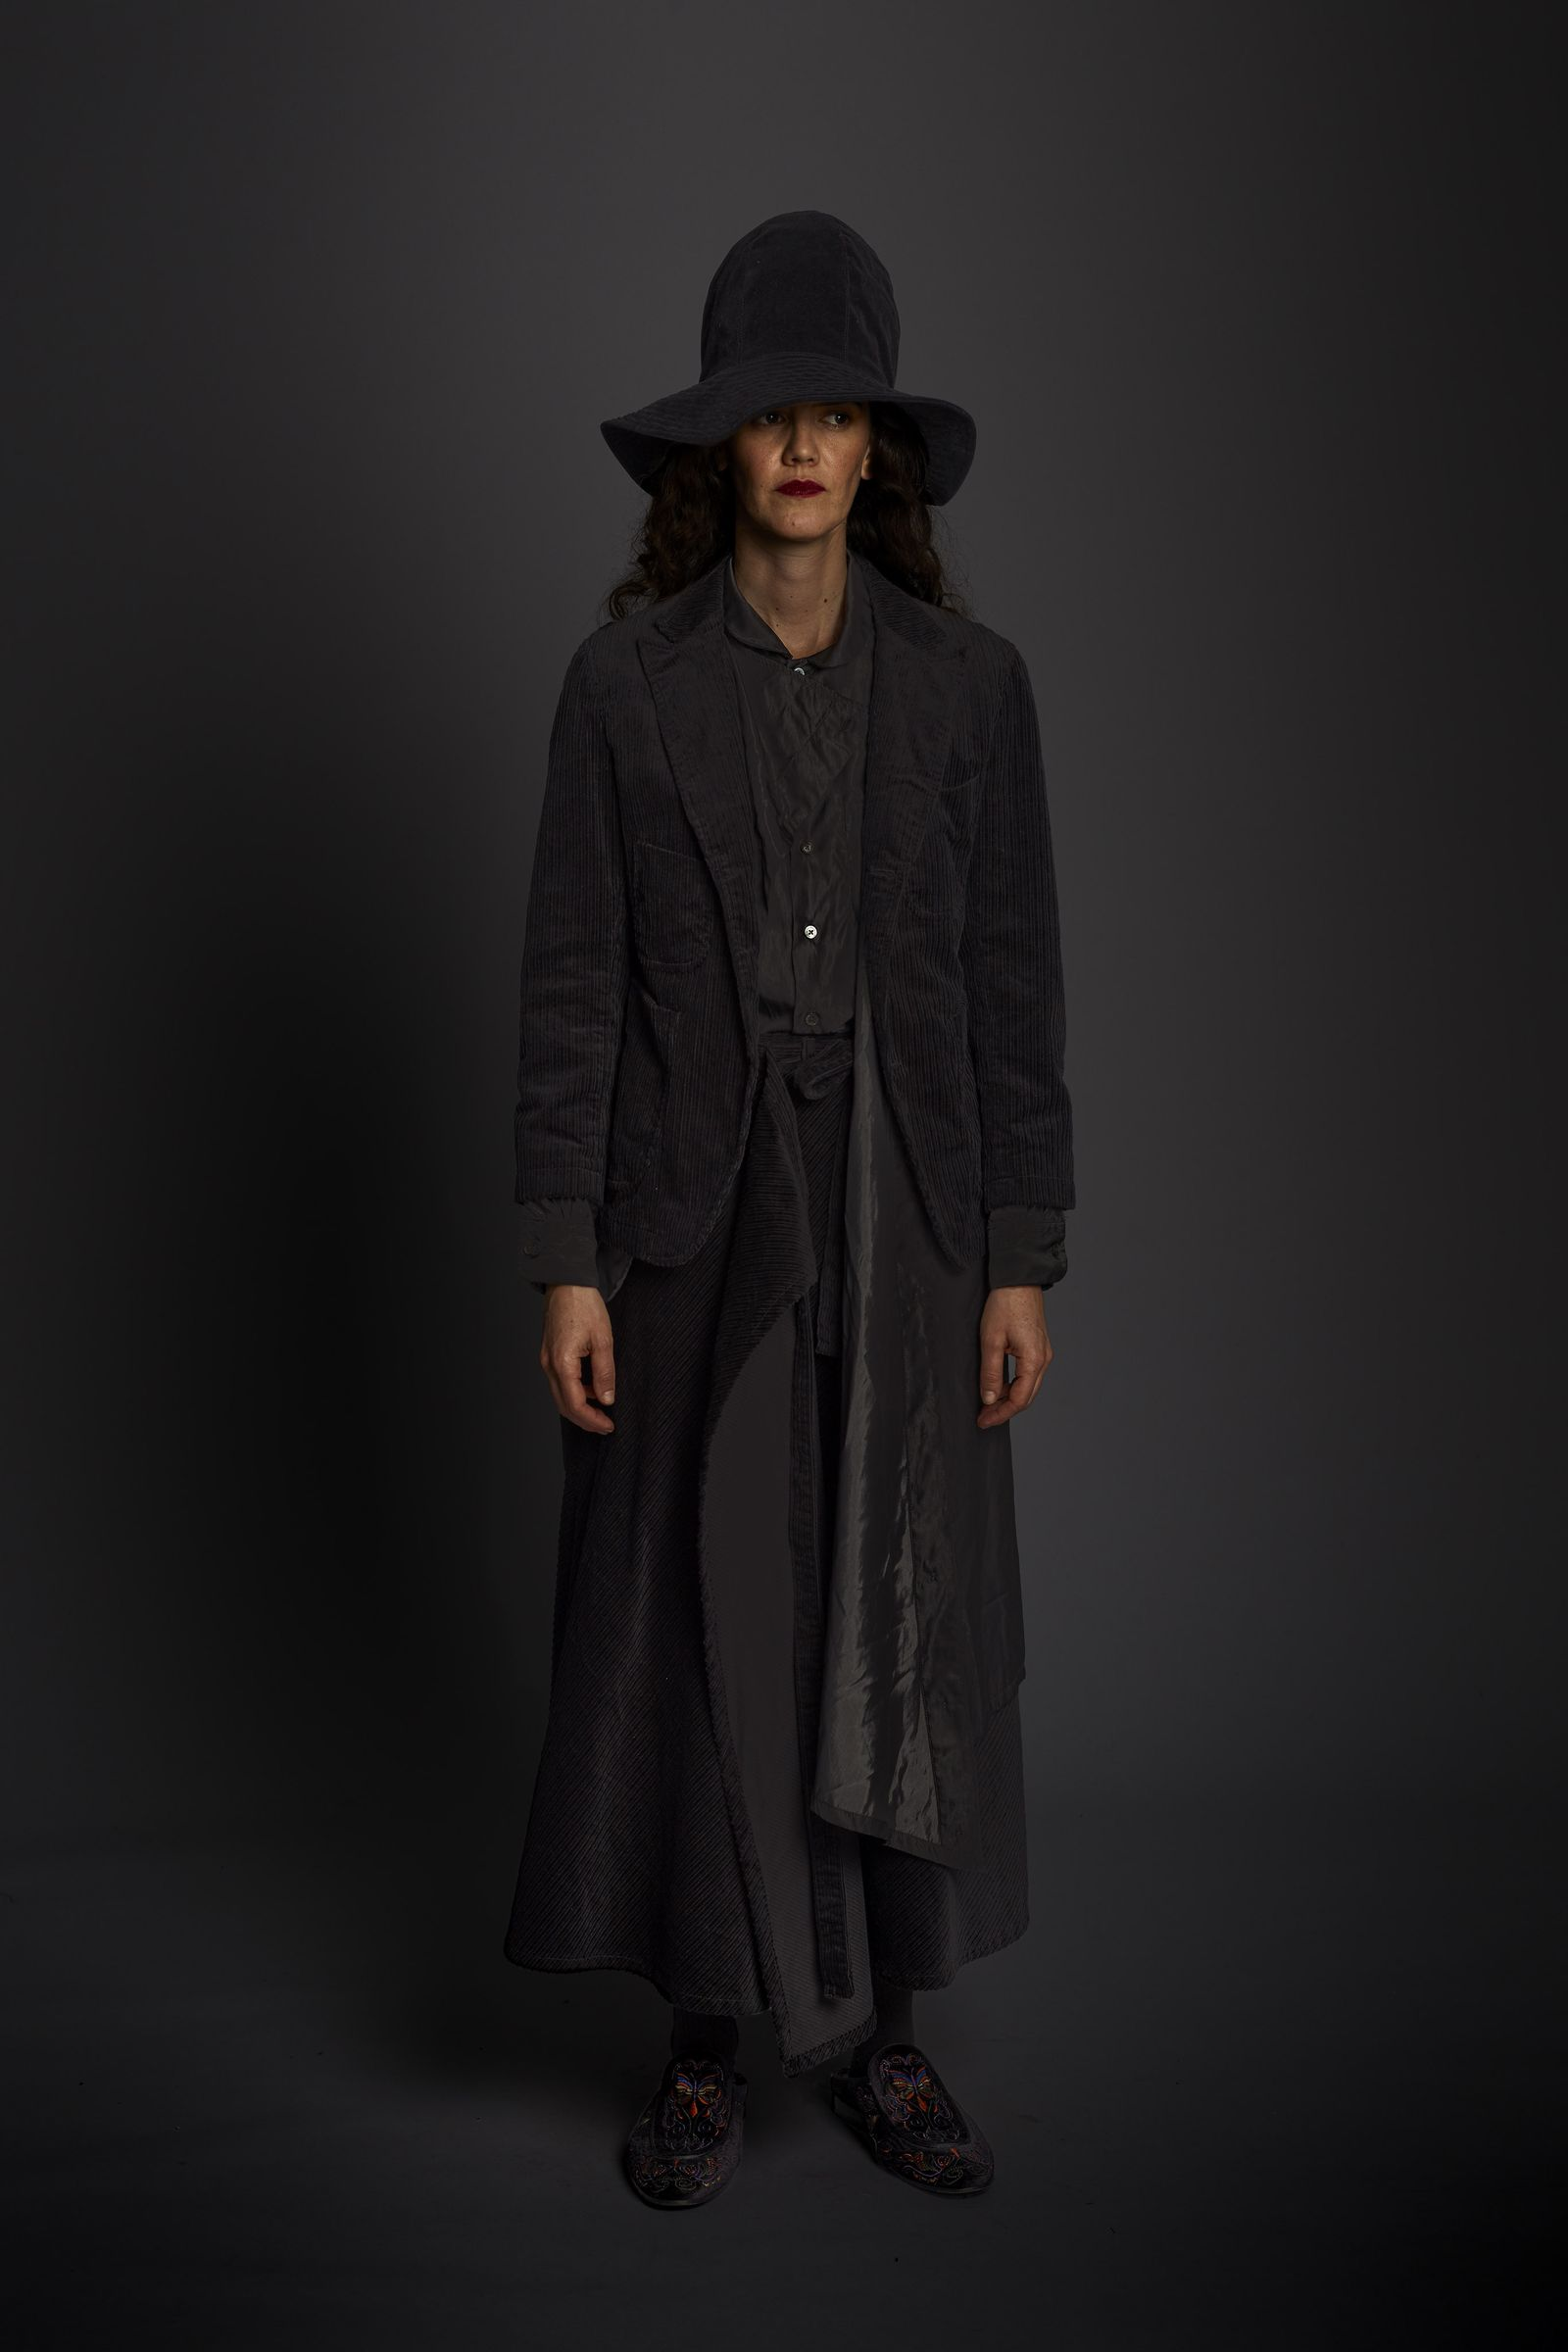 engineered-garments-fall-winter-2020-29